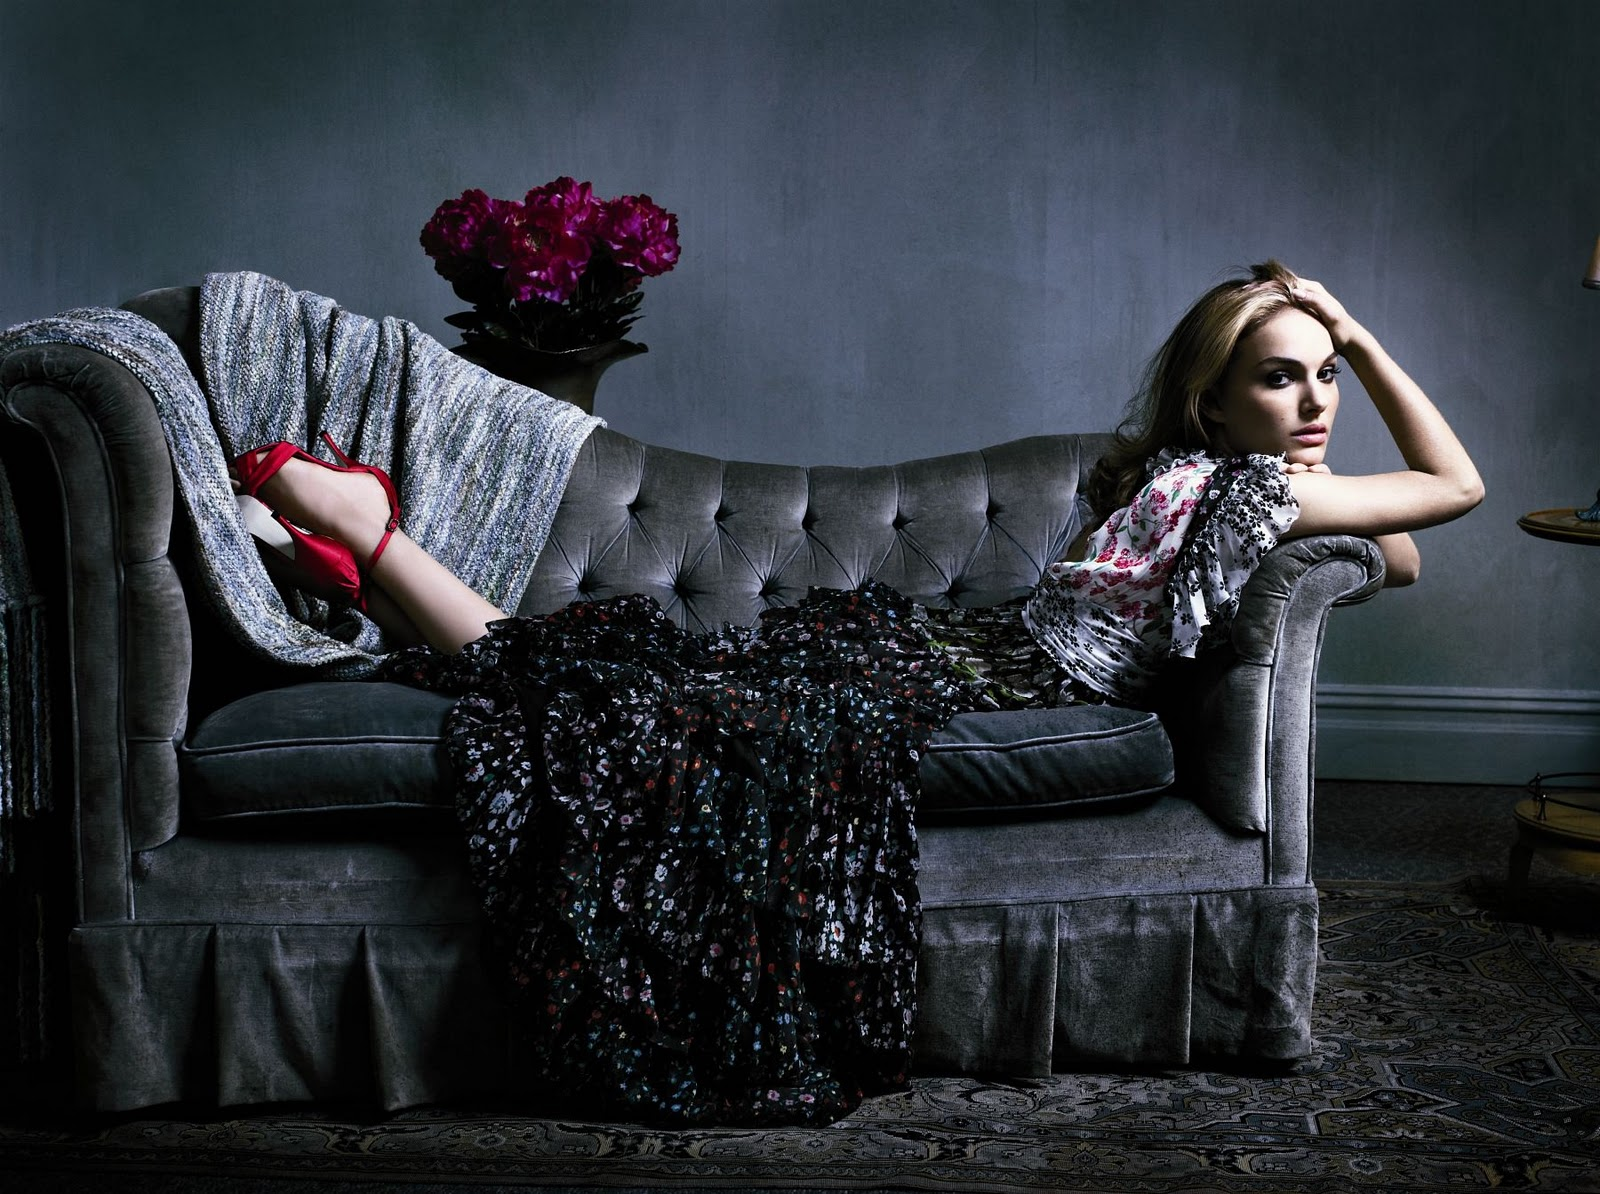 http://3.bp.blogspot.com/_QhQHrMXYV40/TMHp1ghGRLI/AAAAAAAAAJM/cd1YHRrdA18/s1600/natalie_portman_marie_claire05.jpg